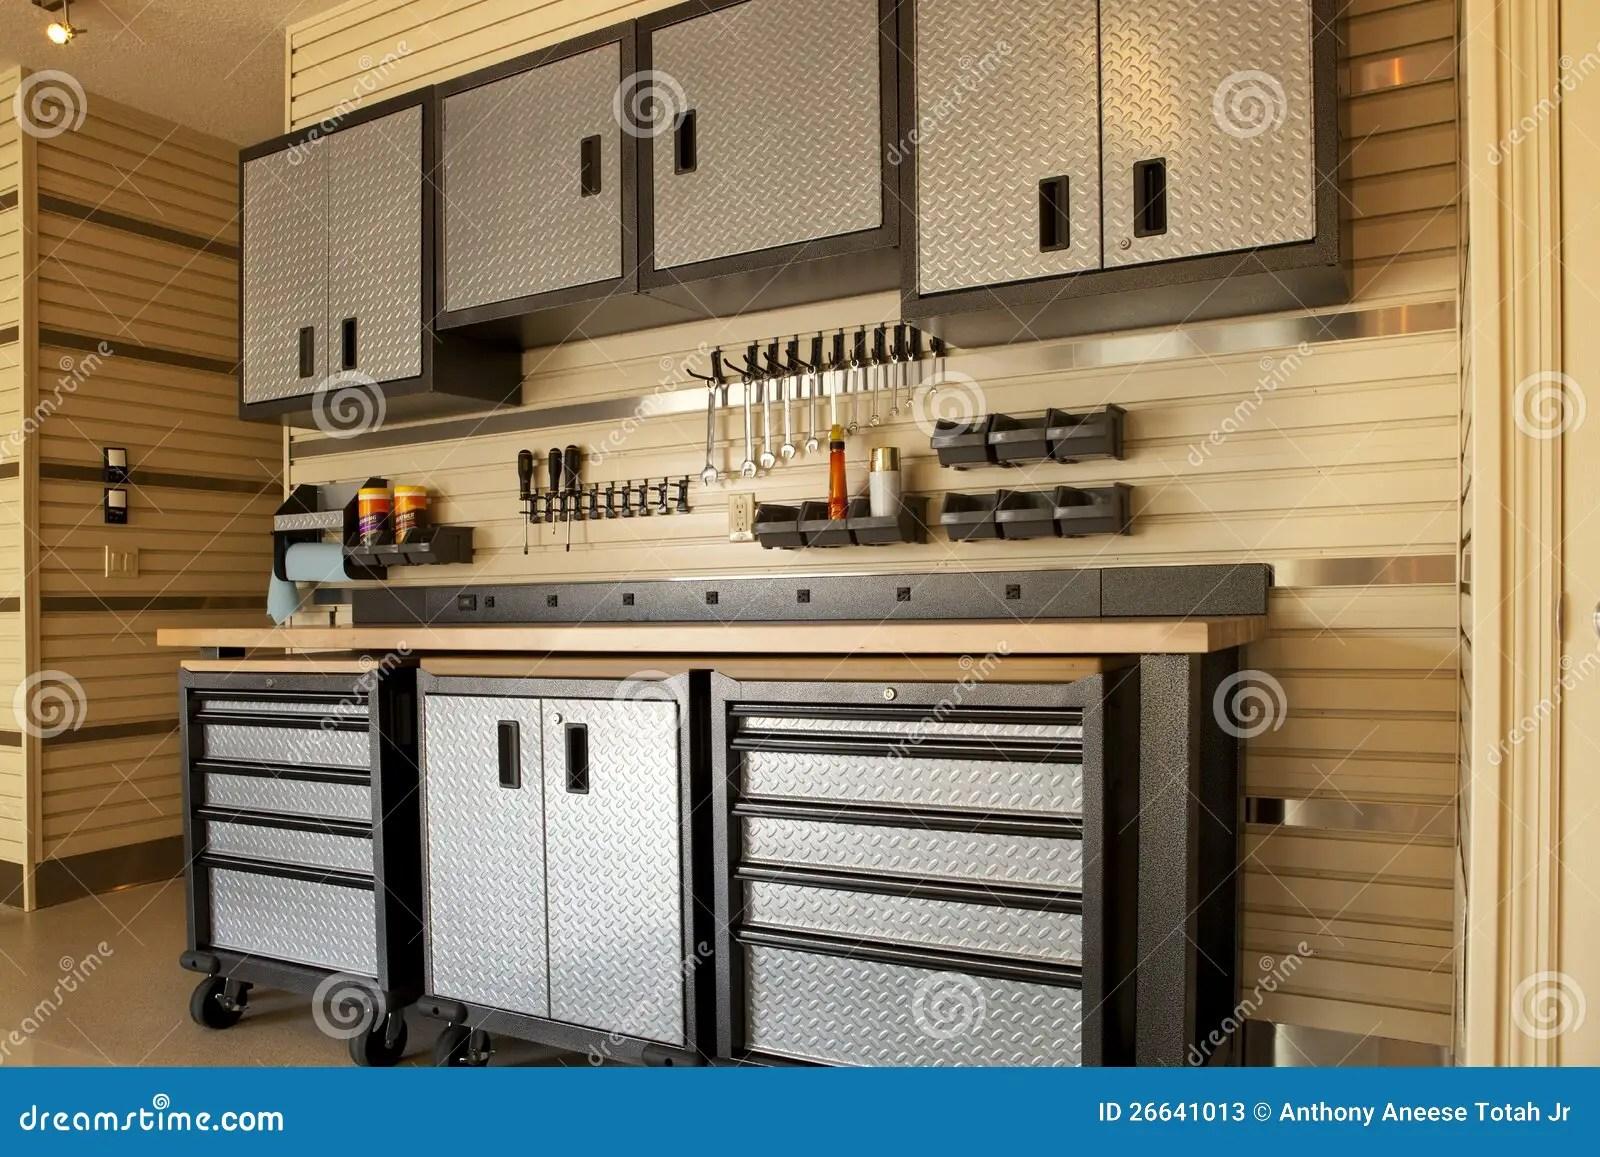 Garage Workspace Stock Photos  Image 26641013